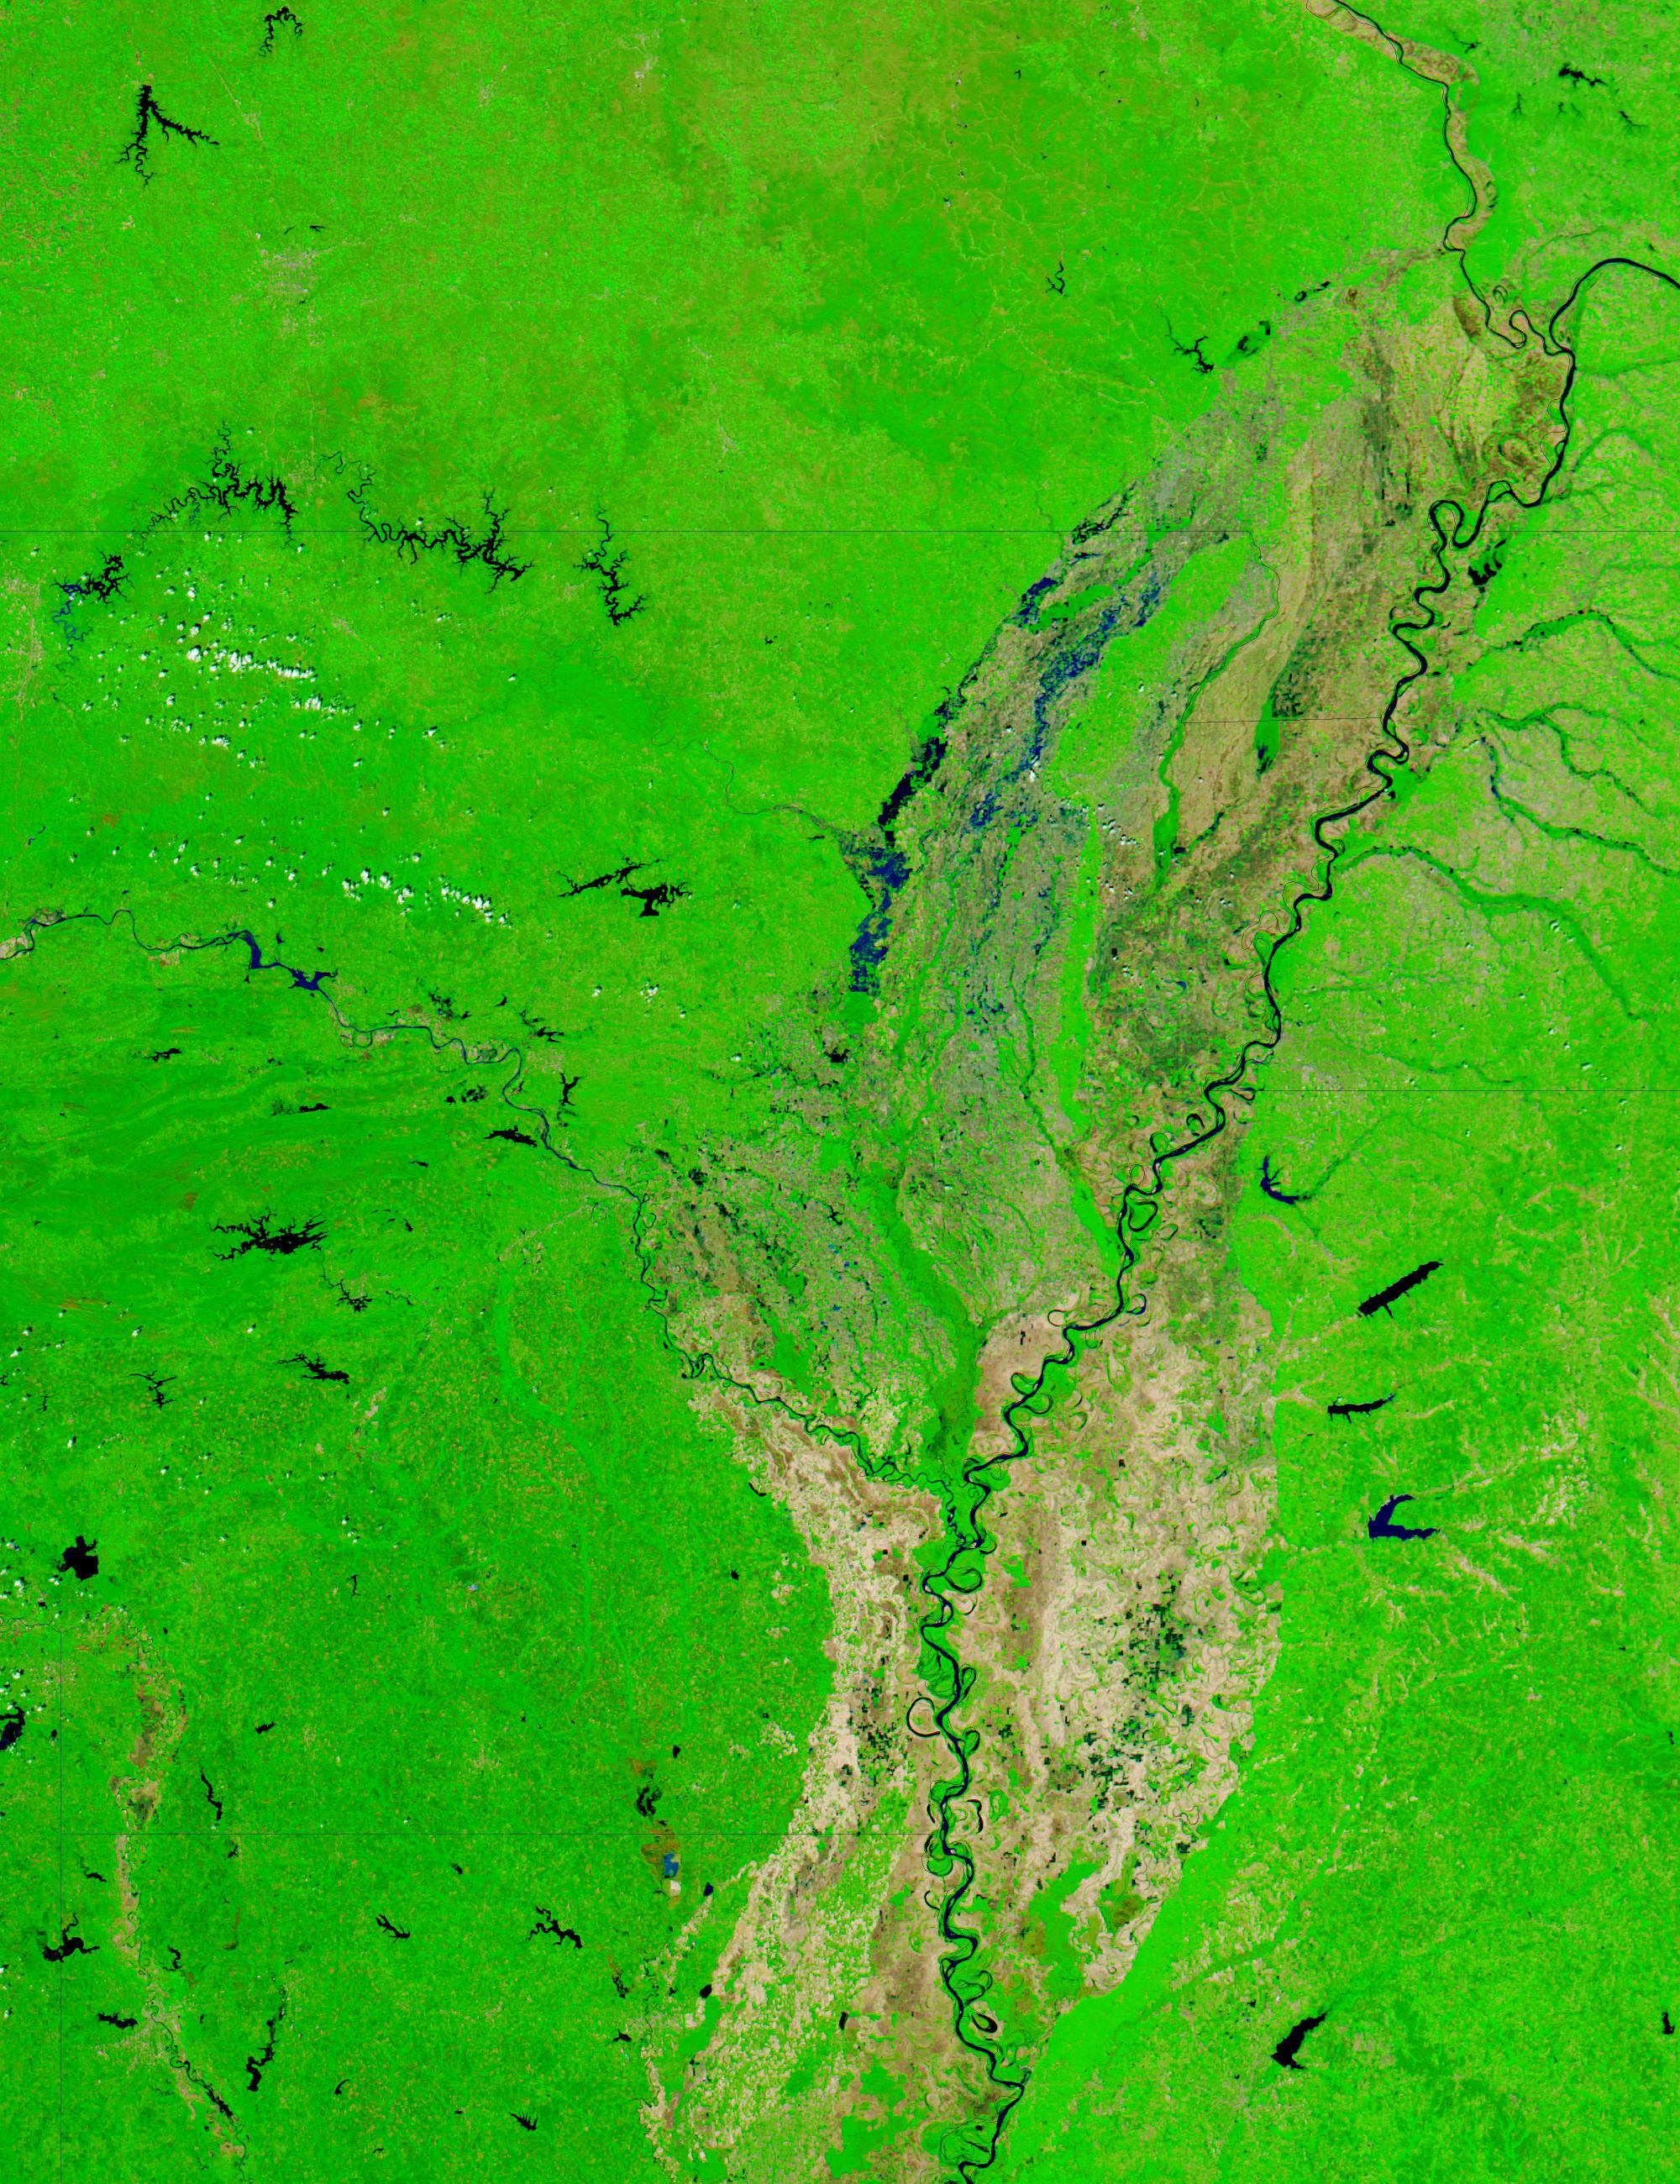 Floods in Arkansas (false color)